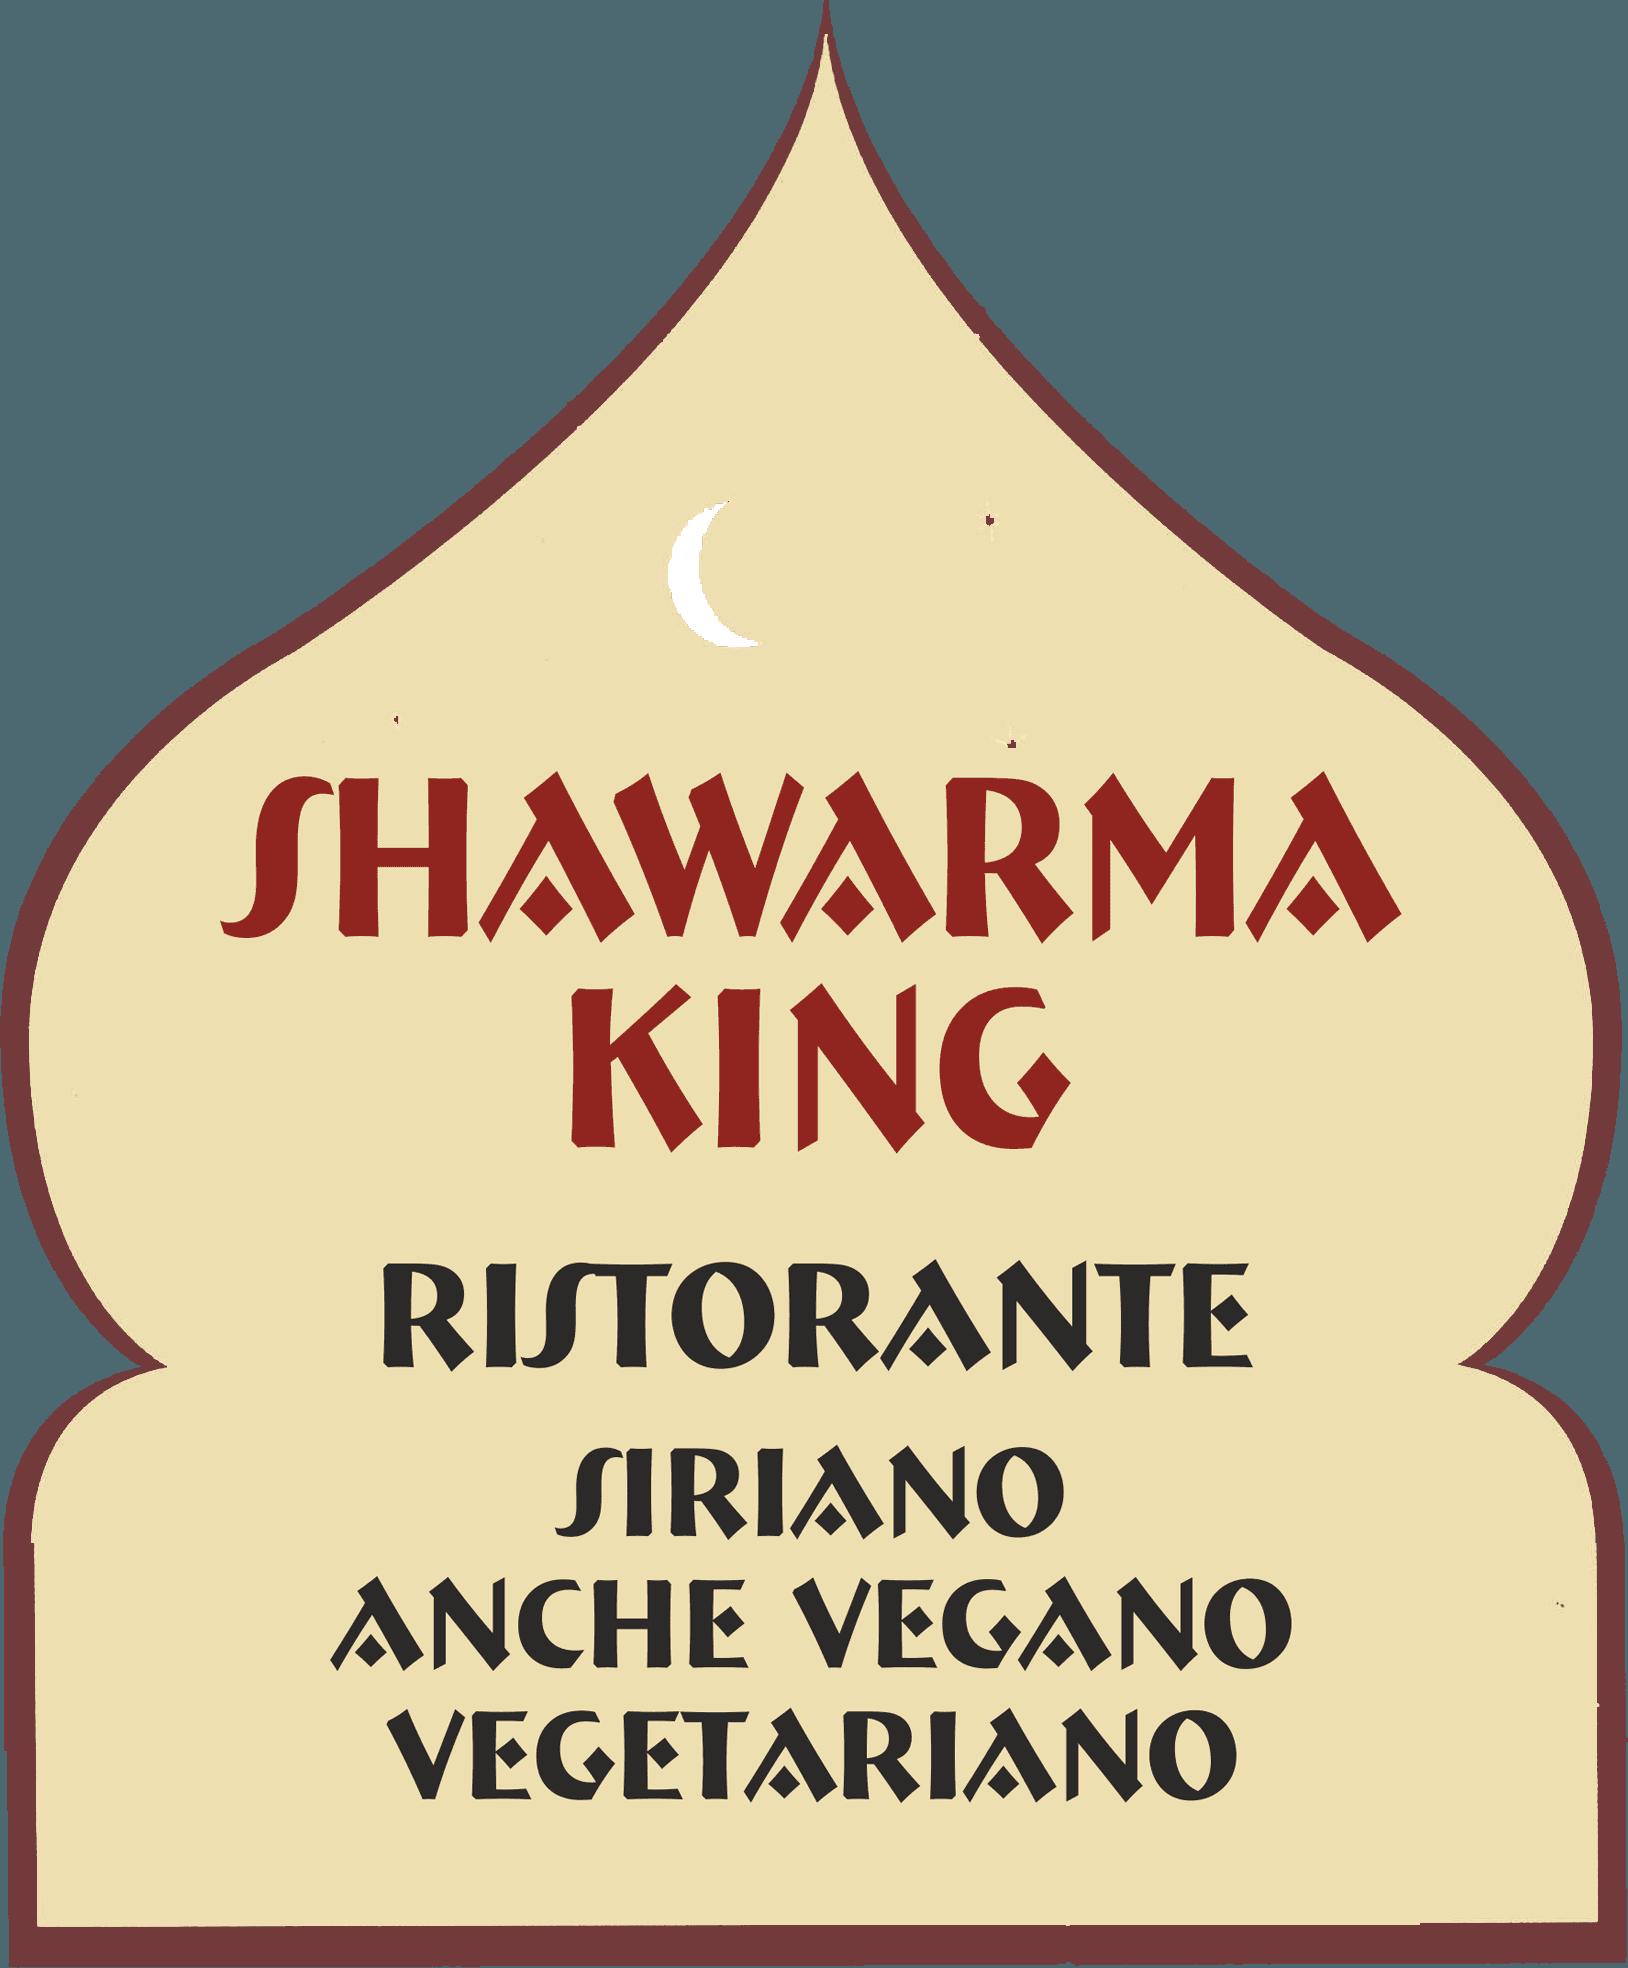 SHAWARMA KING RISTORANTE SIRIANO - logo